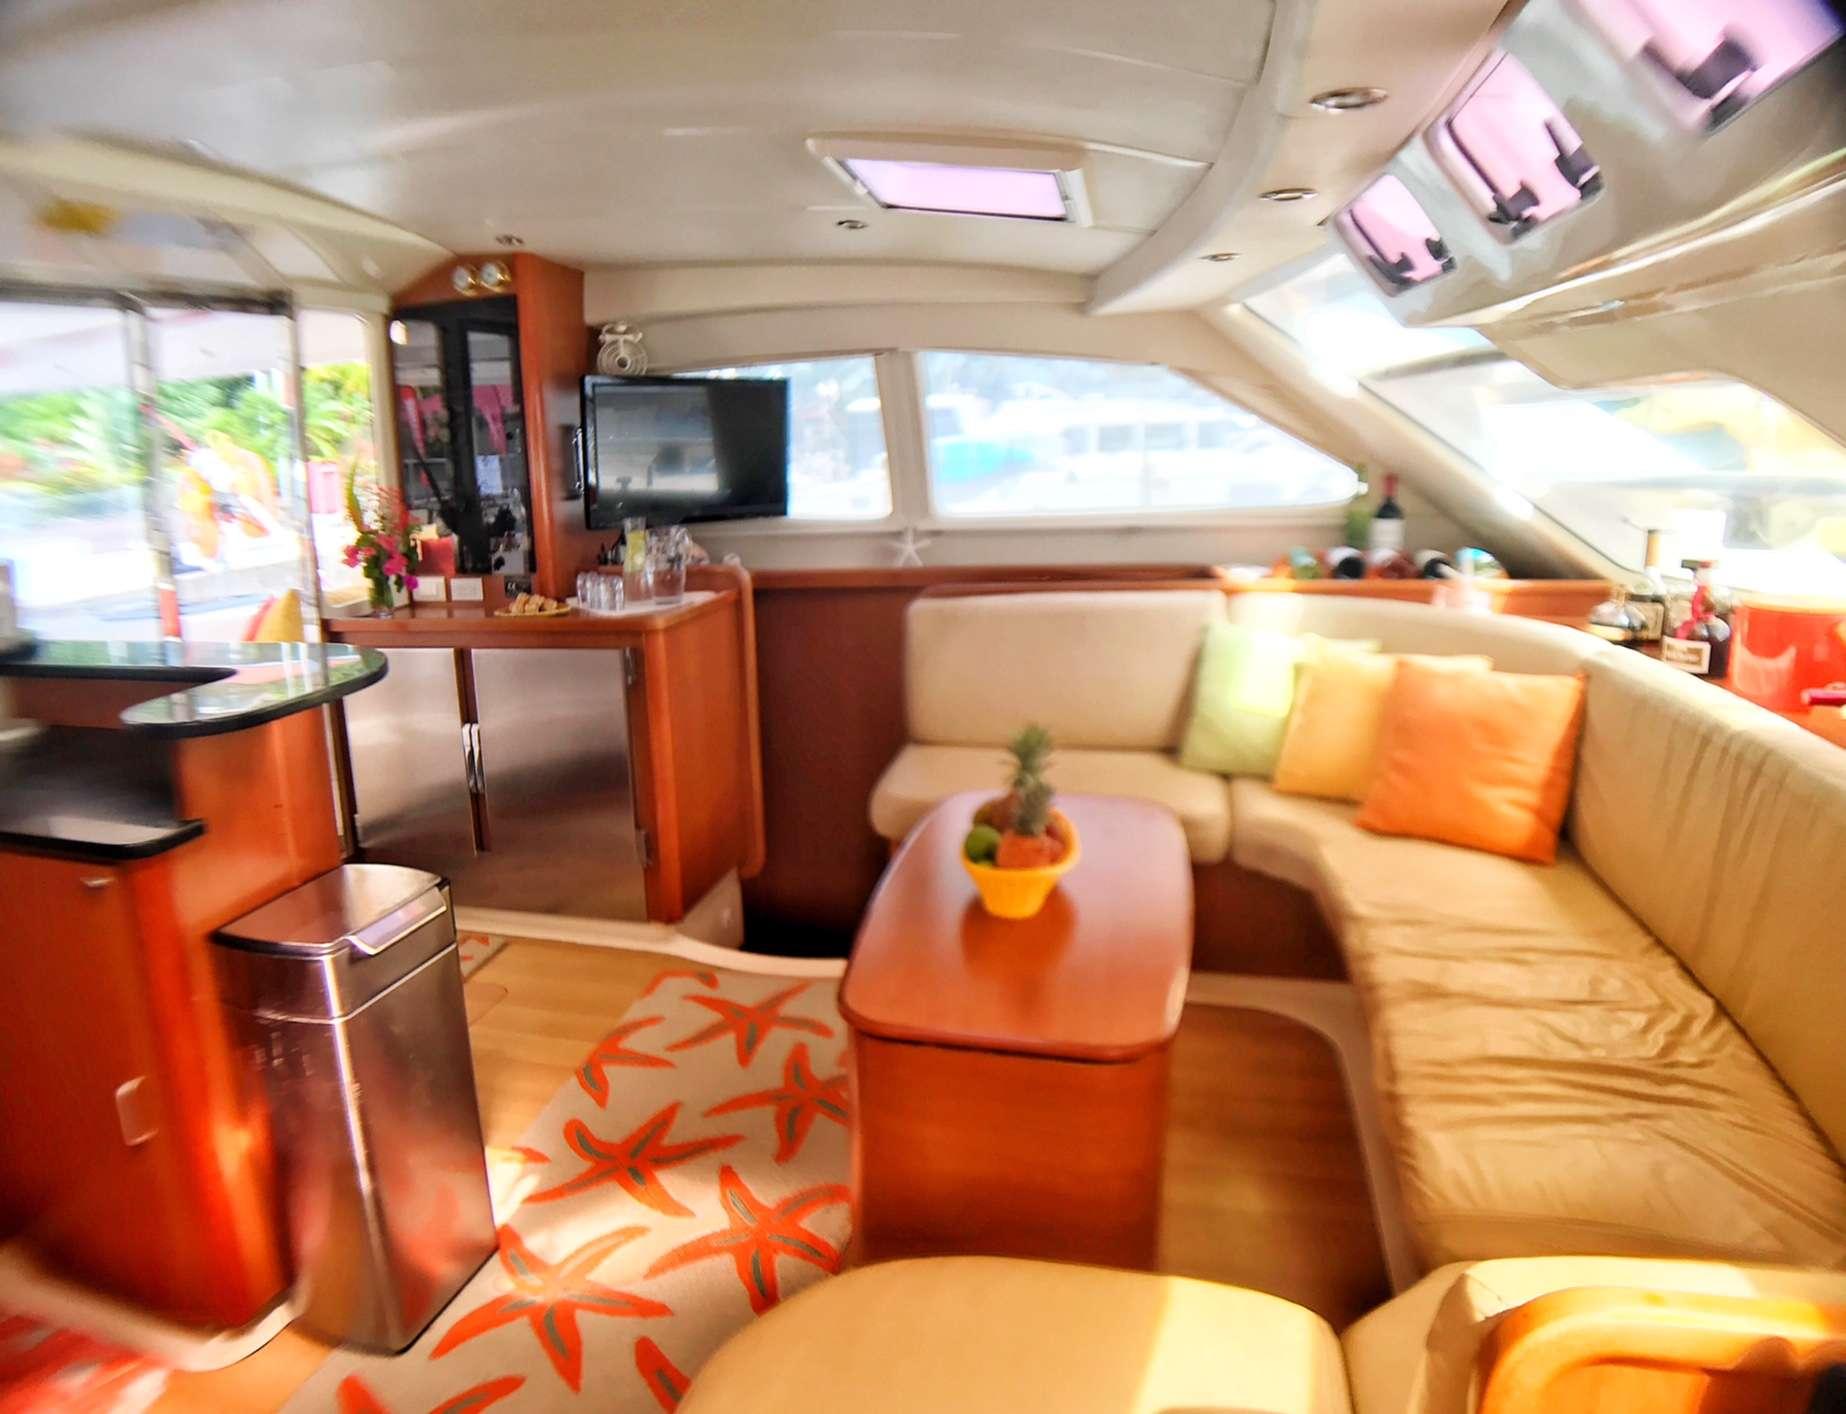 Catamaran Yacht 'STARFISH' Bright and airy salon., 6 PAX, 2 Crew, 46.00 Ft, 14.00 Meters, Built 2008, Leopard, Refit Year 2019